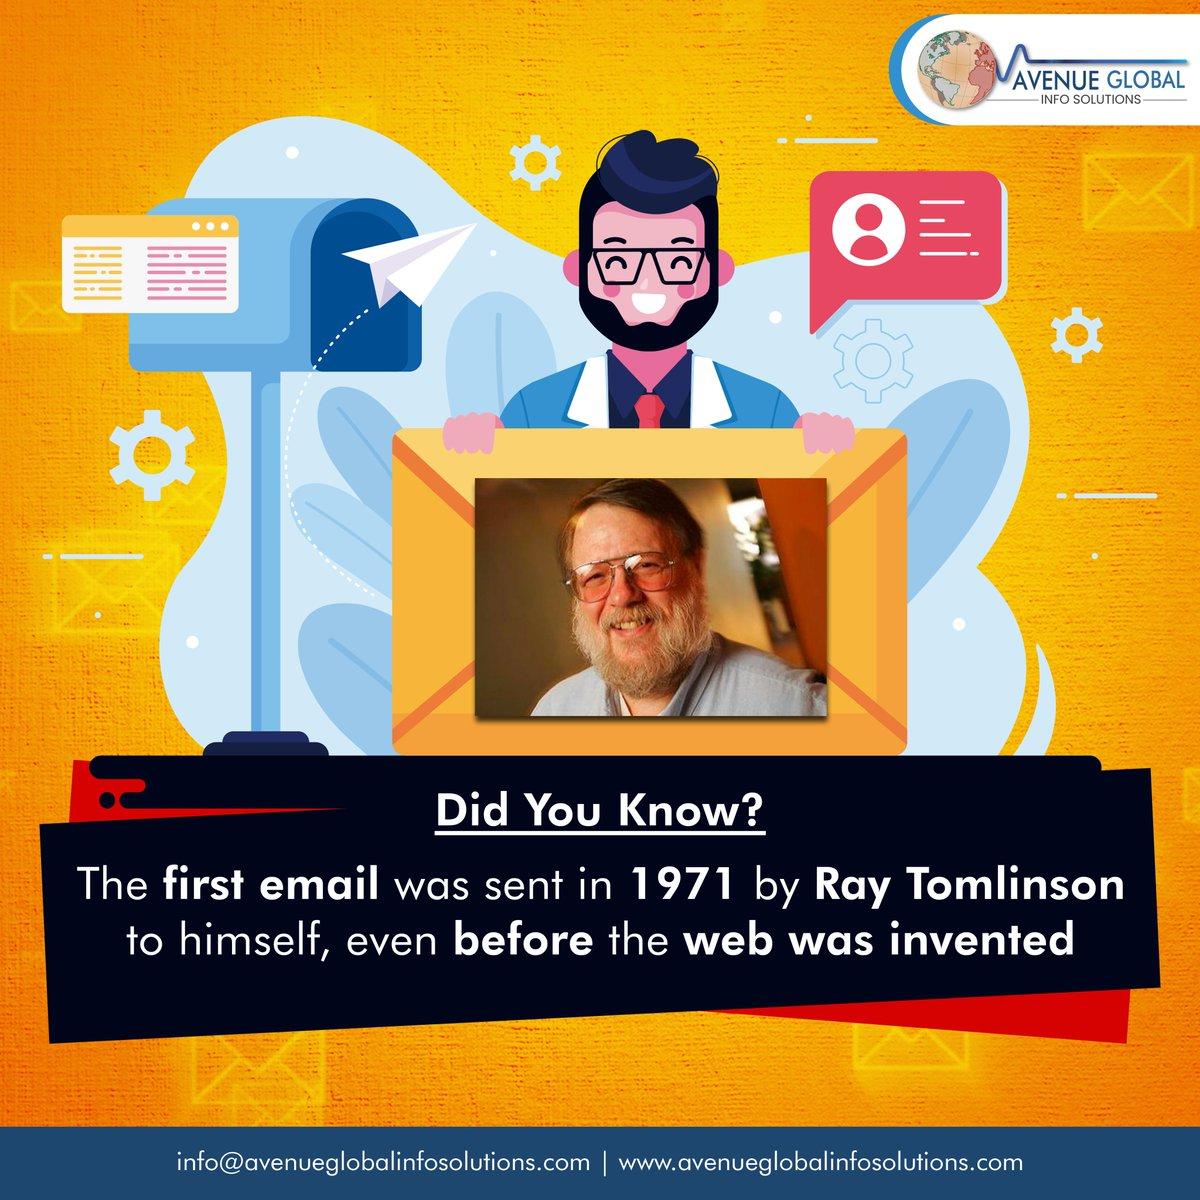 Did You Know?  #Didyouknow #email #RayTomlinson #EmailMarketing #webdesigncompany #websitedeveloper #webdesigntips #instatech #socialmediamarketing  #avenueglobal #AGIS #Webdesigning #Digitalmarketing #Websitedevelopment #websitebuilder #ITcompany #Punepic.twitter.com/sBsiwM5889